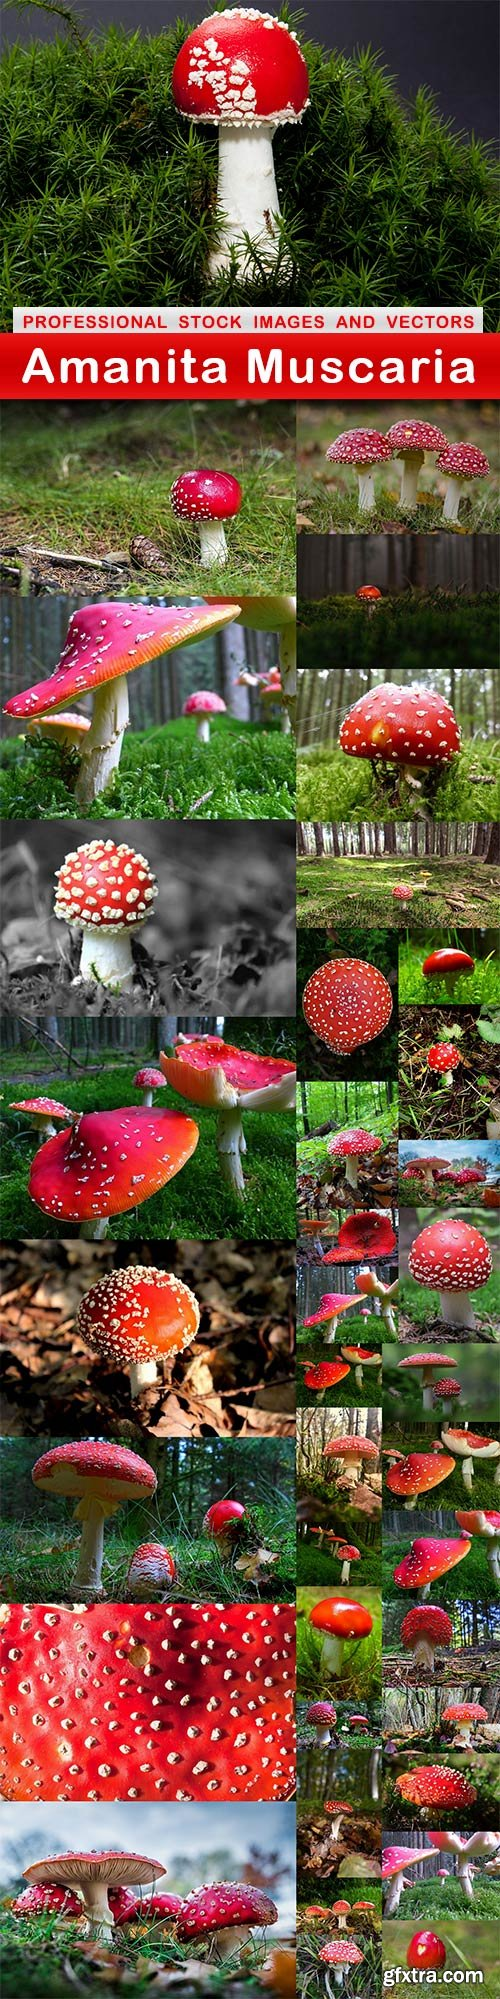 Amanita Muscaria - 45 UHQ JPEG